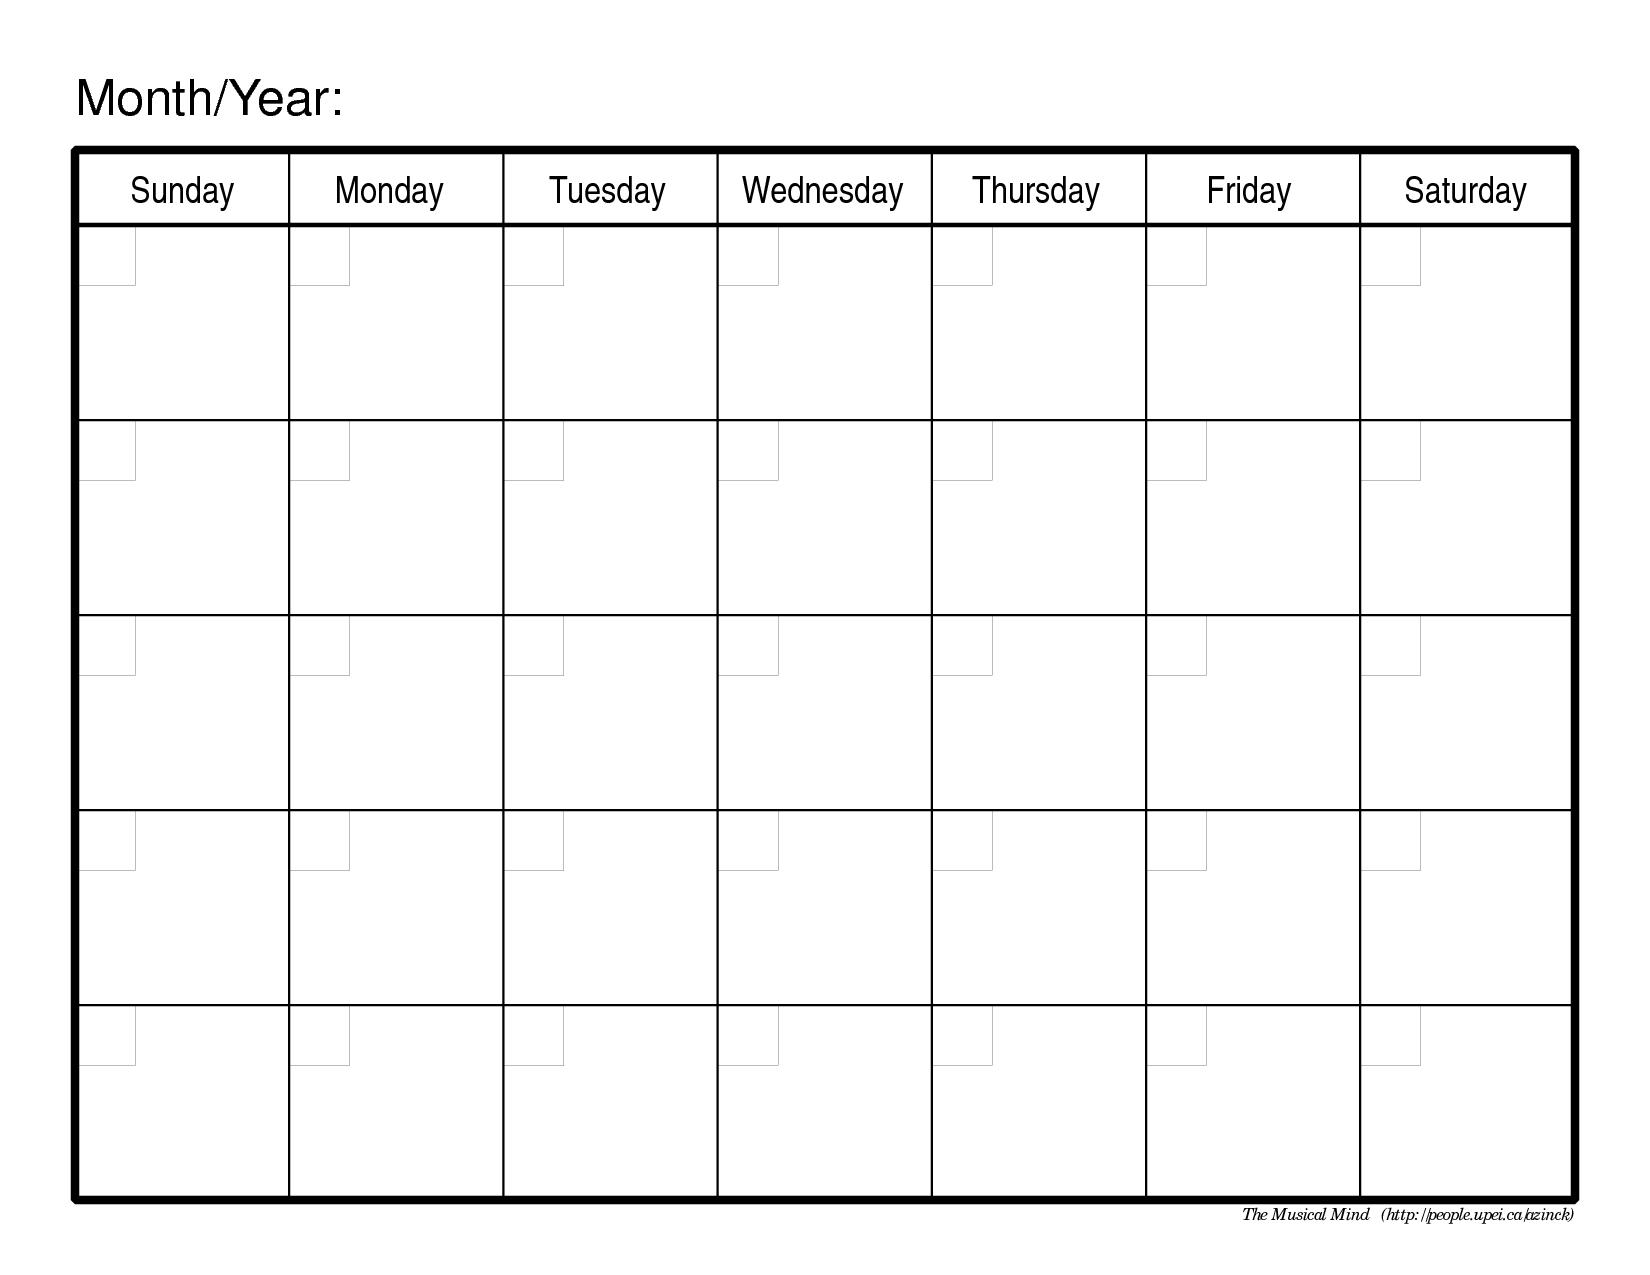 Calendar Monthly Editable : Editable monthly calendar templates template